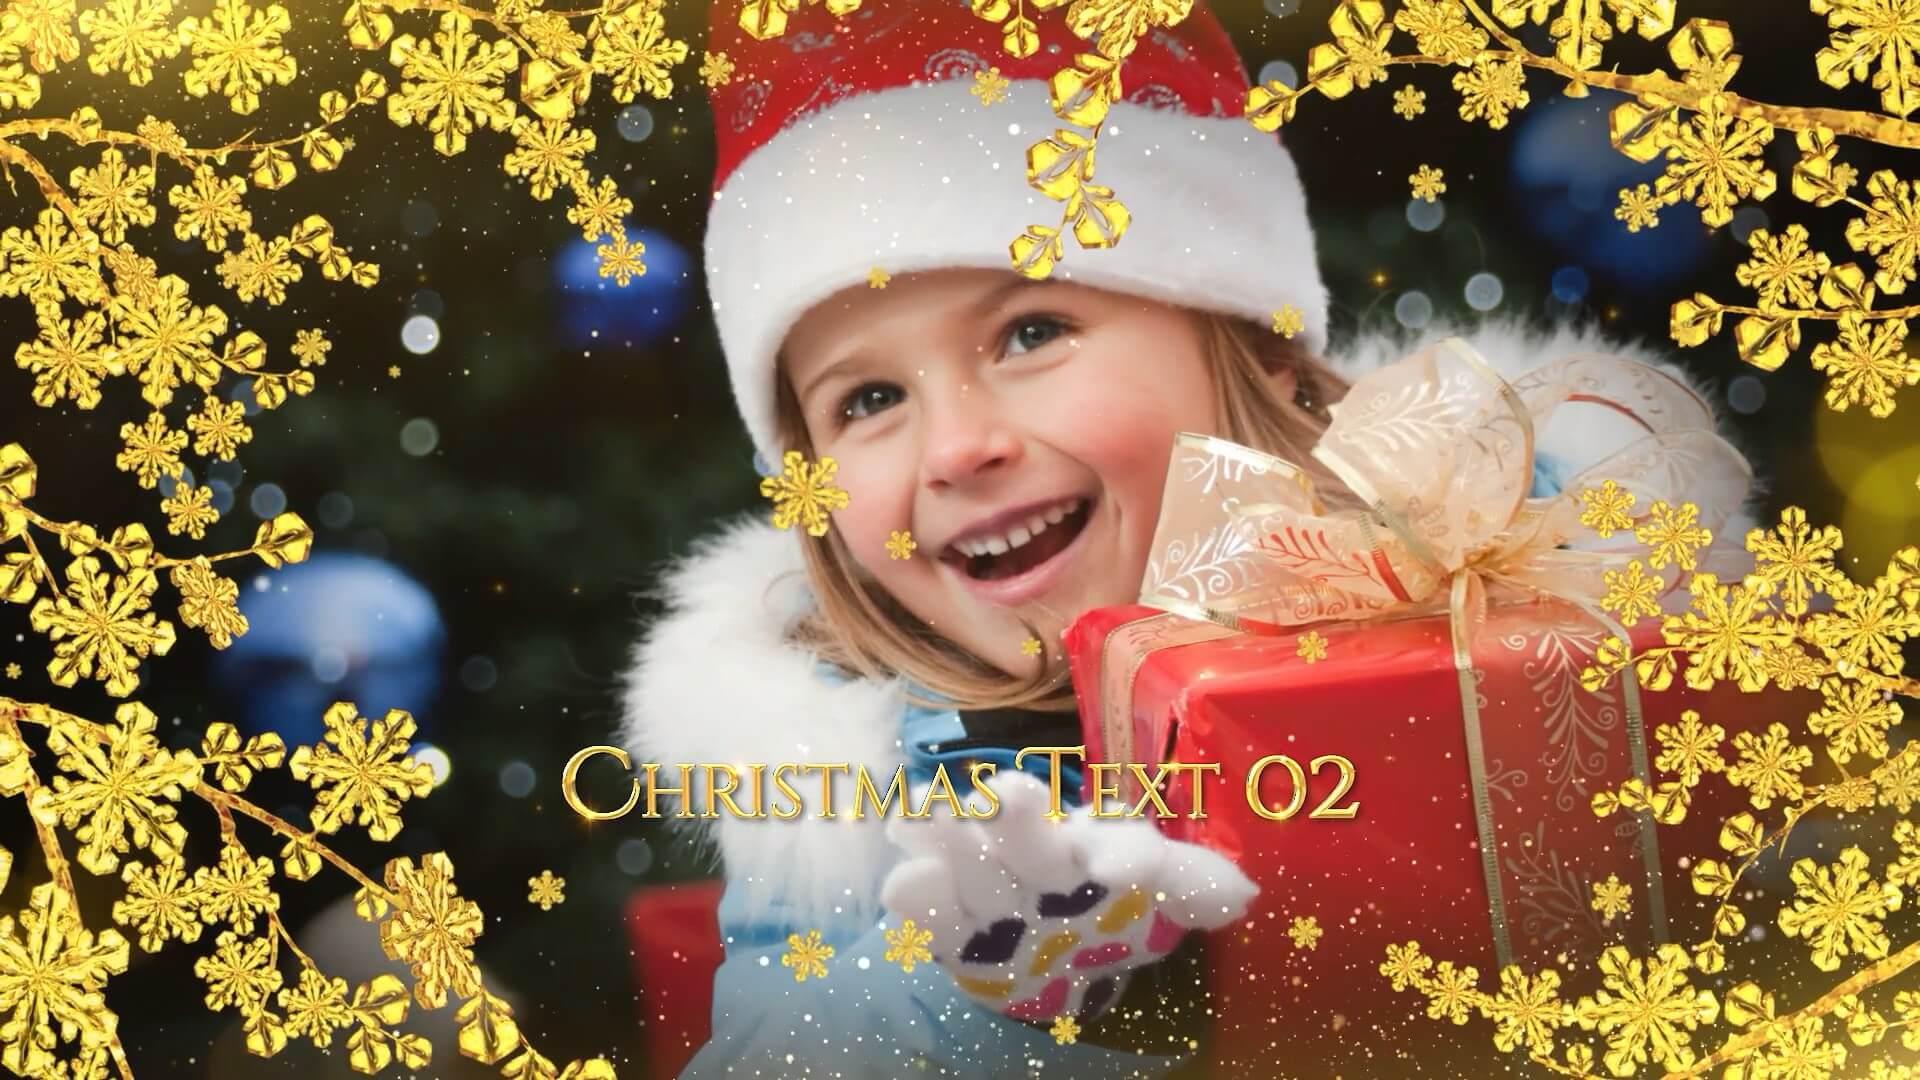 fcpx插件 圣诞节假期幻灯片相册金色图文展示模板 Christmas Slideshow